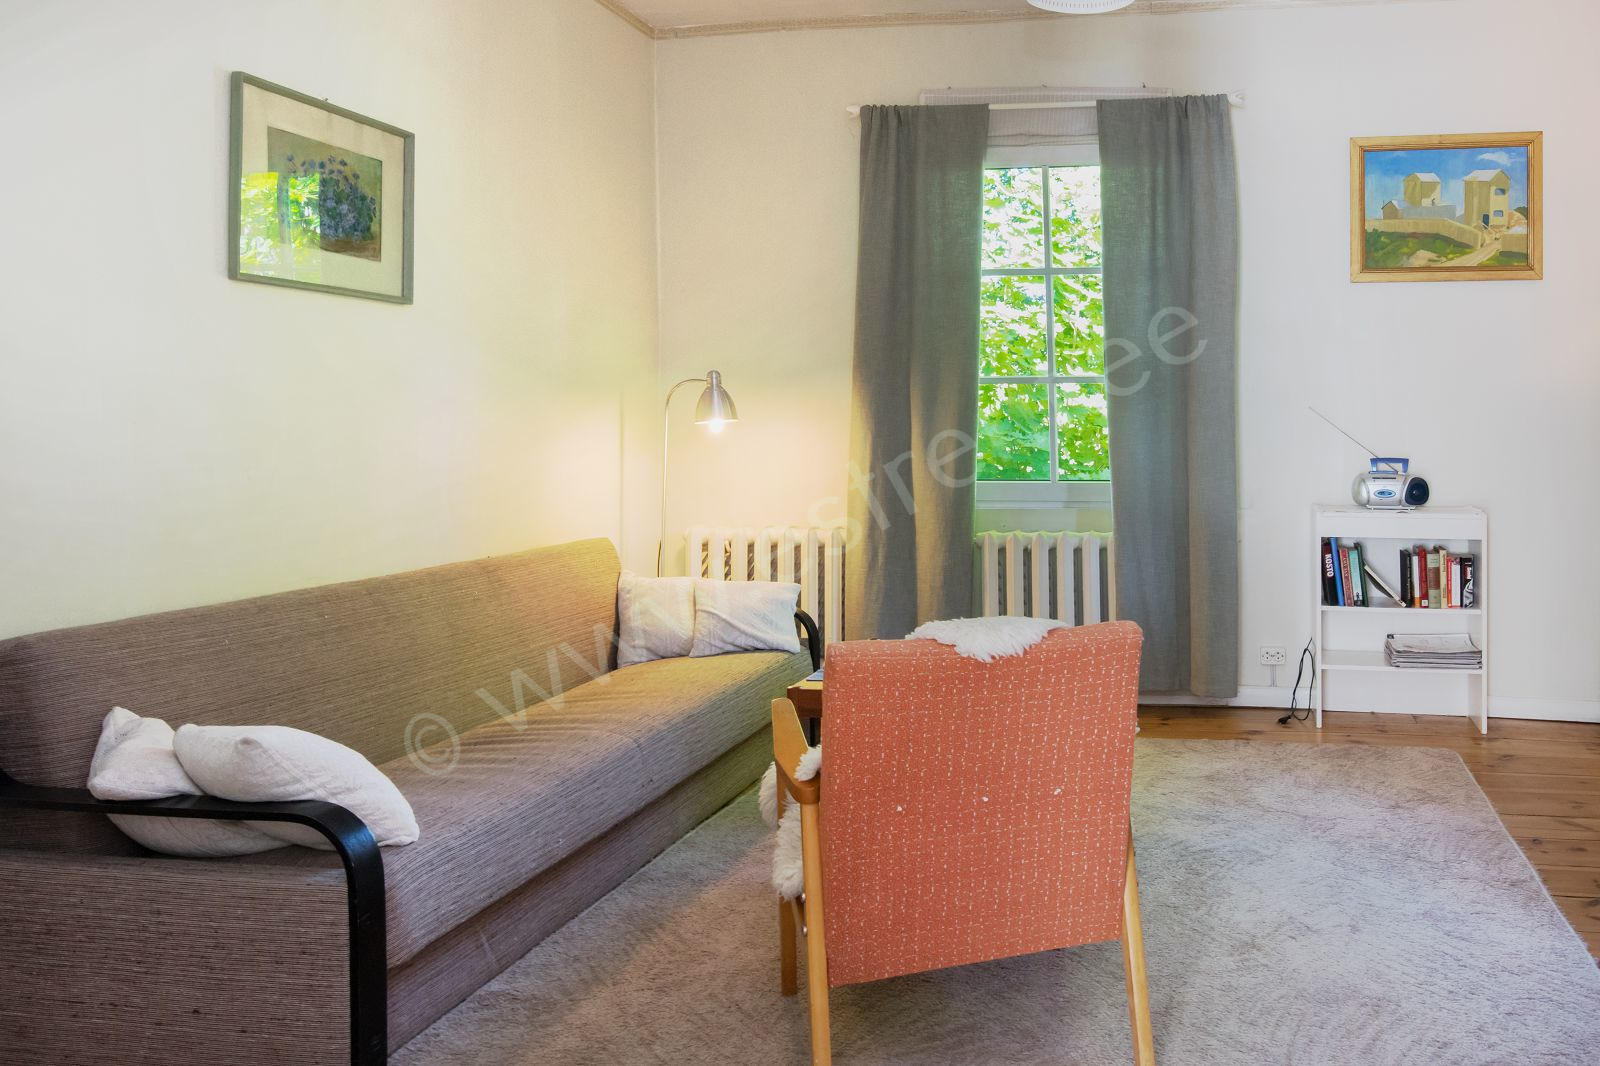 dreizimmerwohnung - kodu » tallinn » harjumaa » estland, Badezimmer ideen